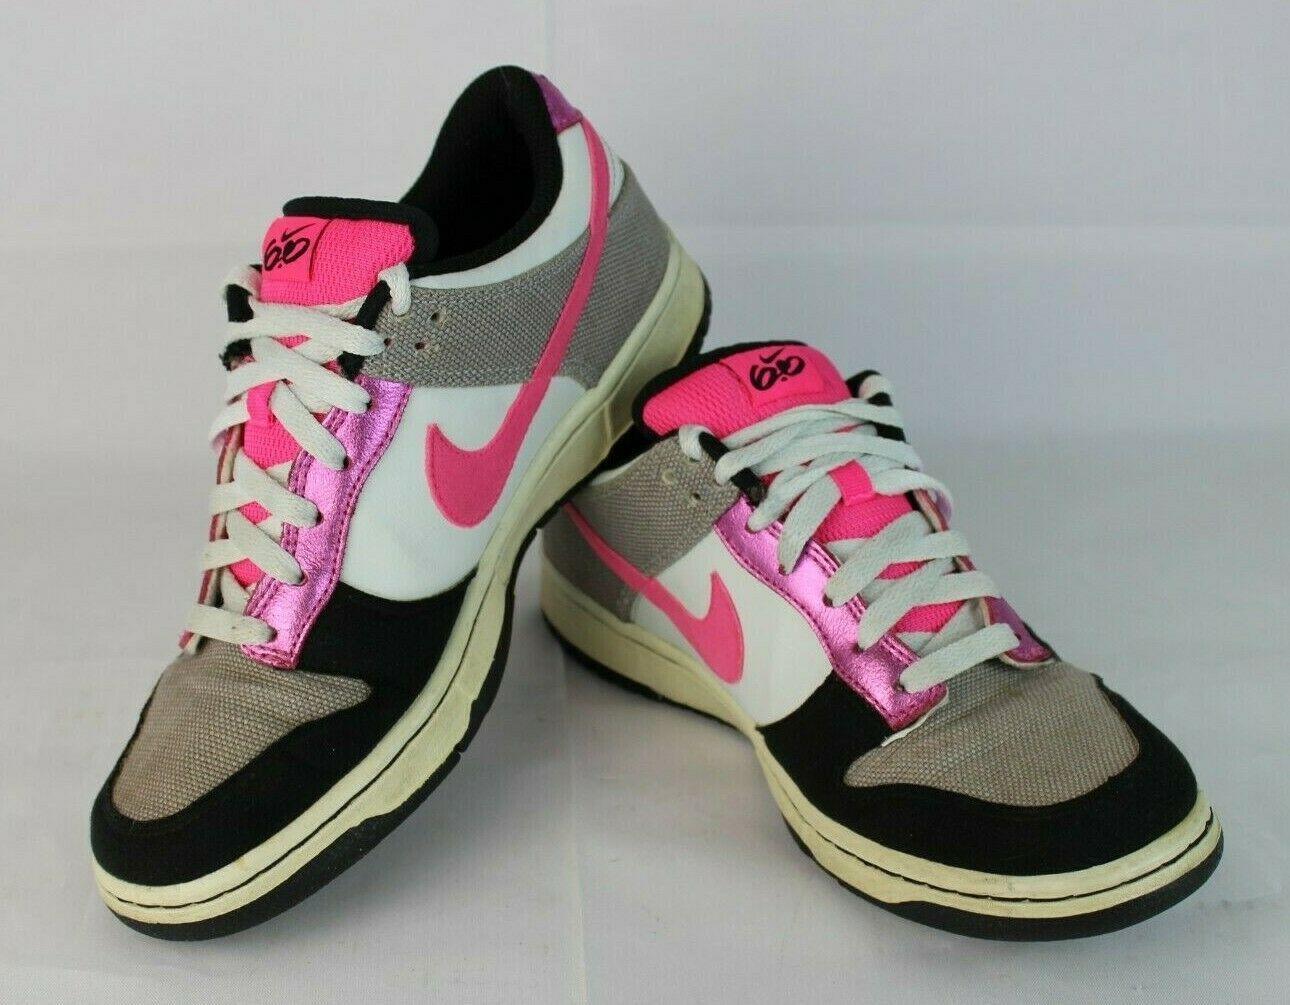 Nike 6.0 Damen Sneakers Retro Schuhe Mehrfarbig Leder Leinen Schnürsenkel Größe